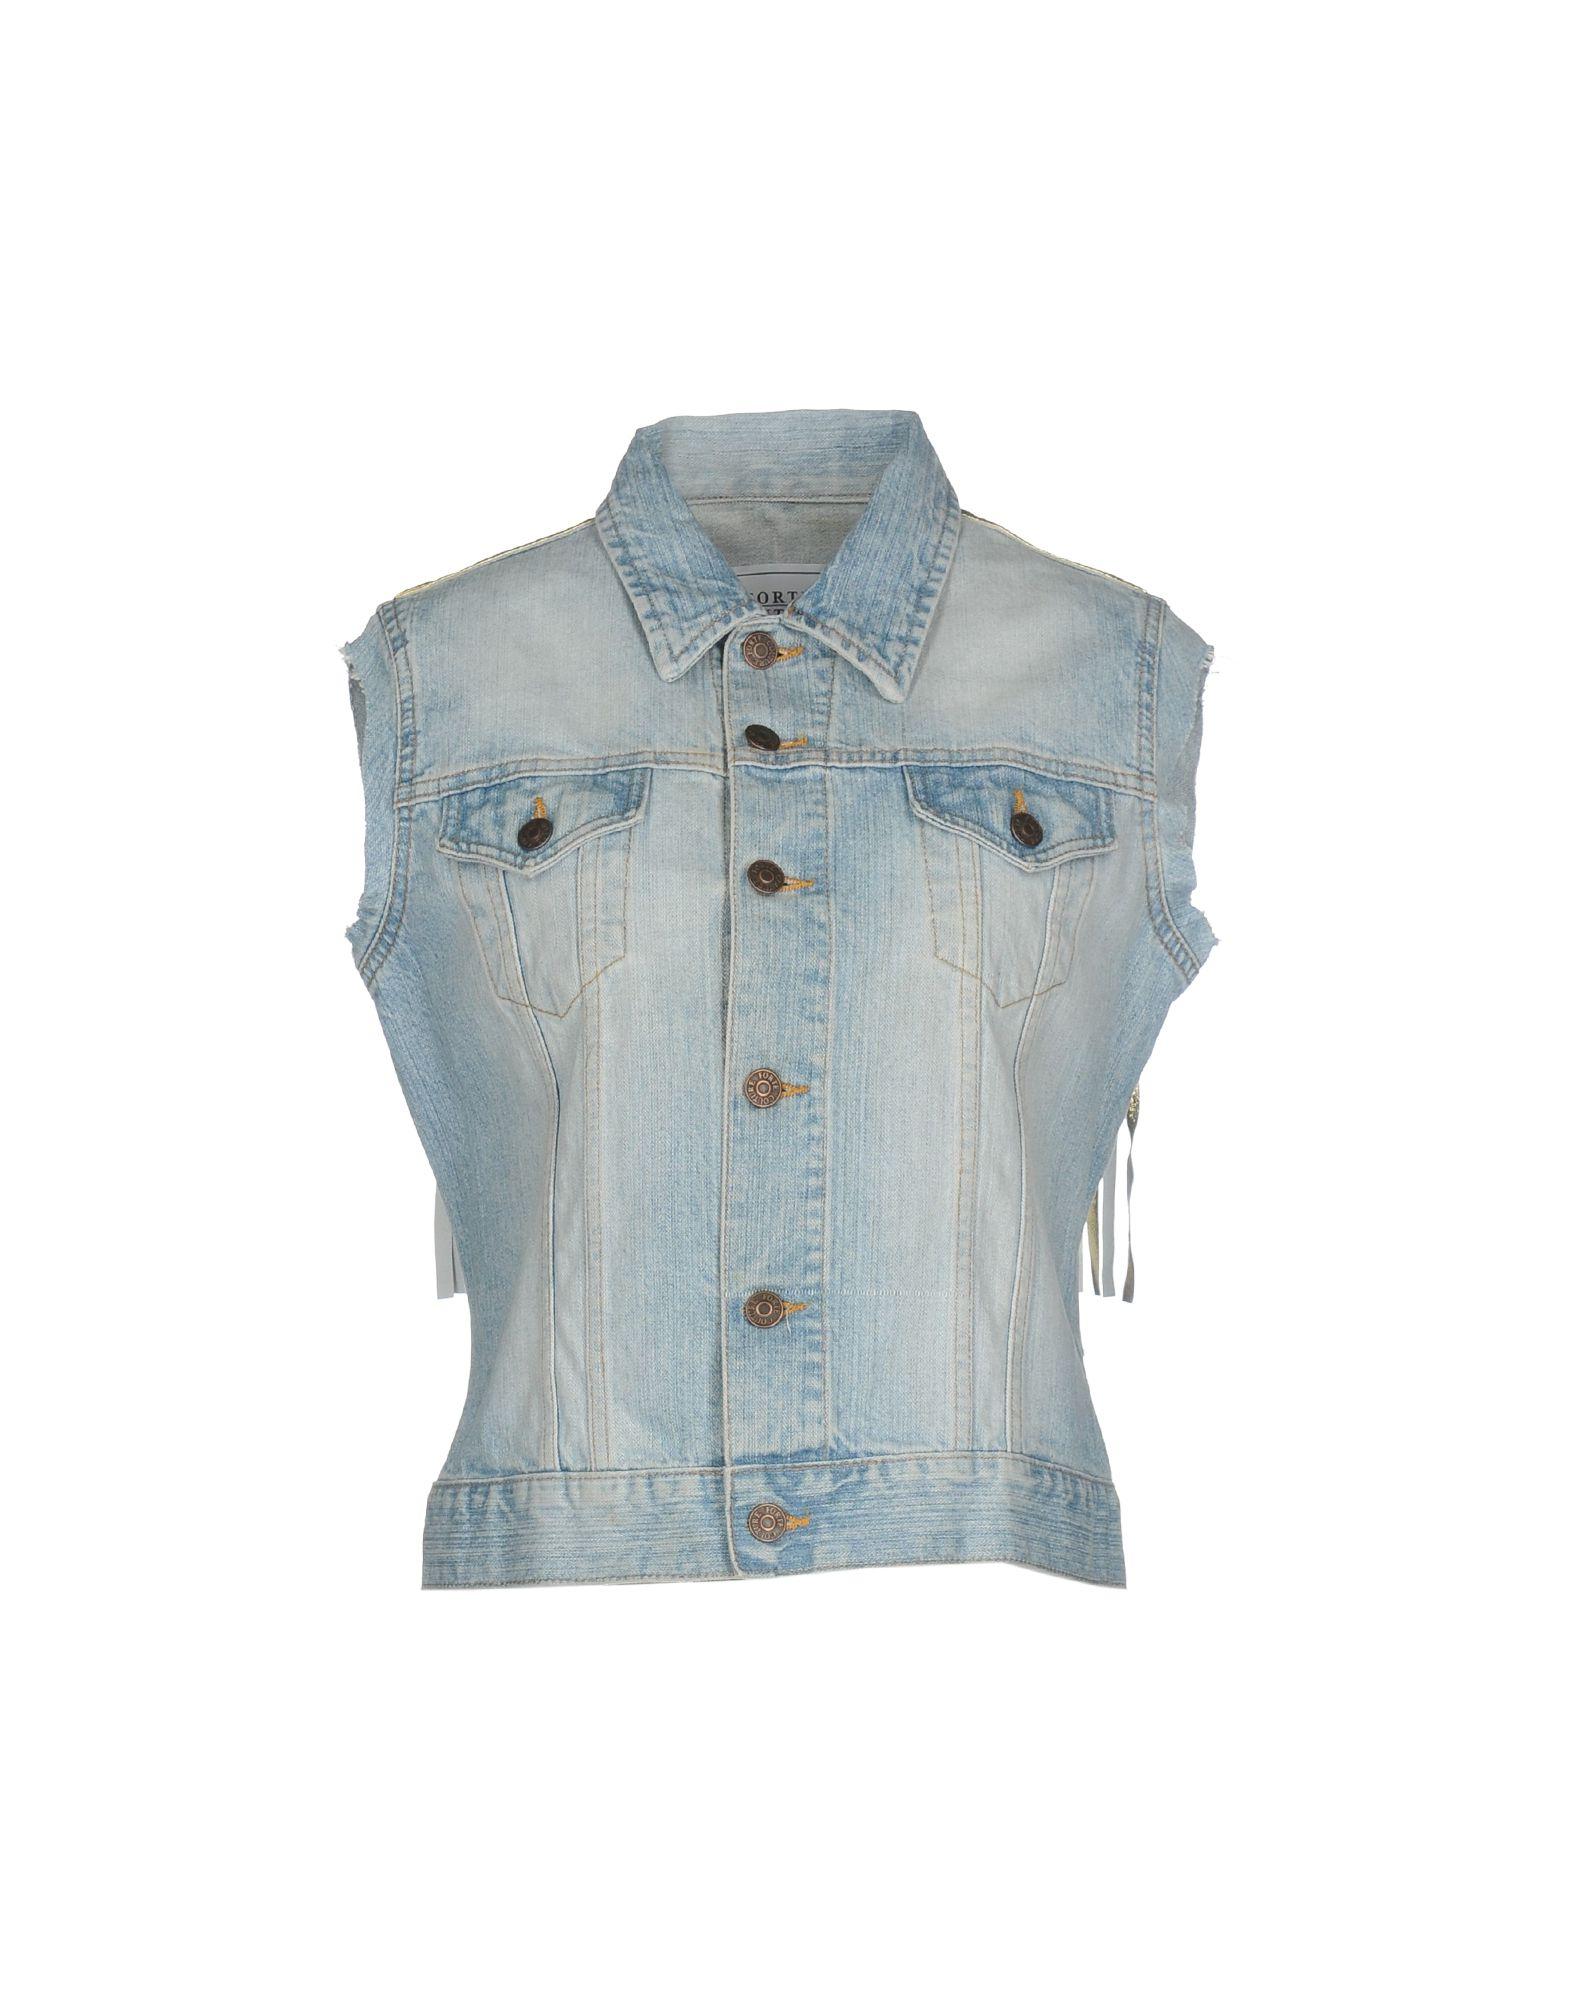 FORTE COUTURE Джинсовая верхняя одежда bencivenga couture джинсовая верхняя одежда